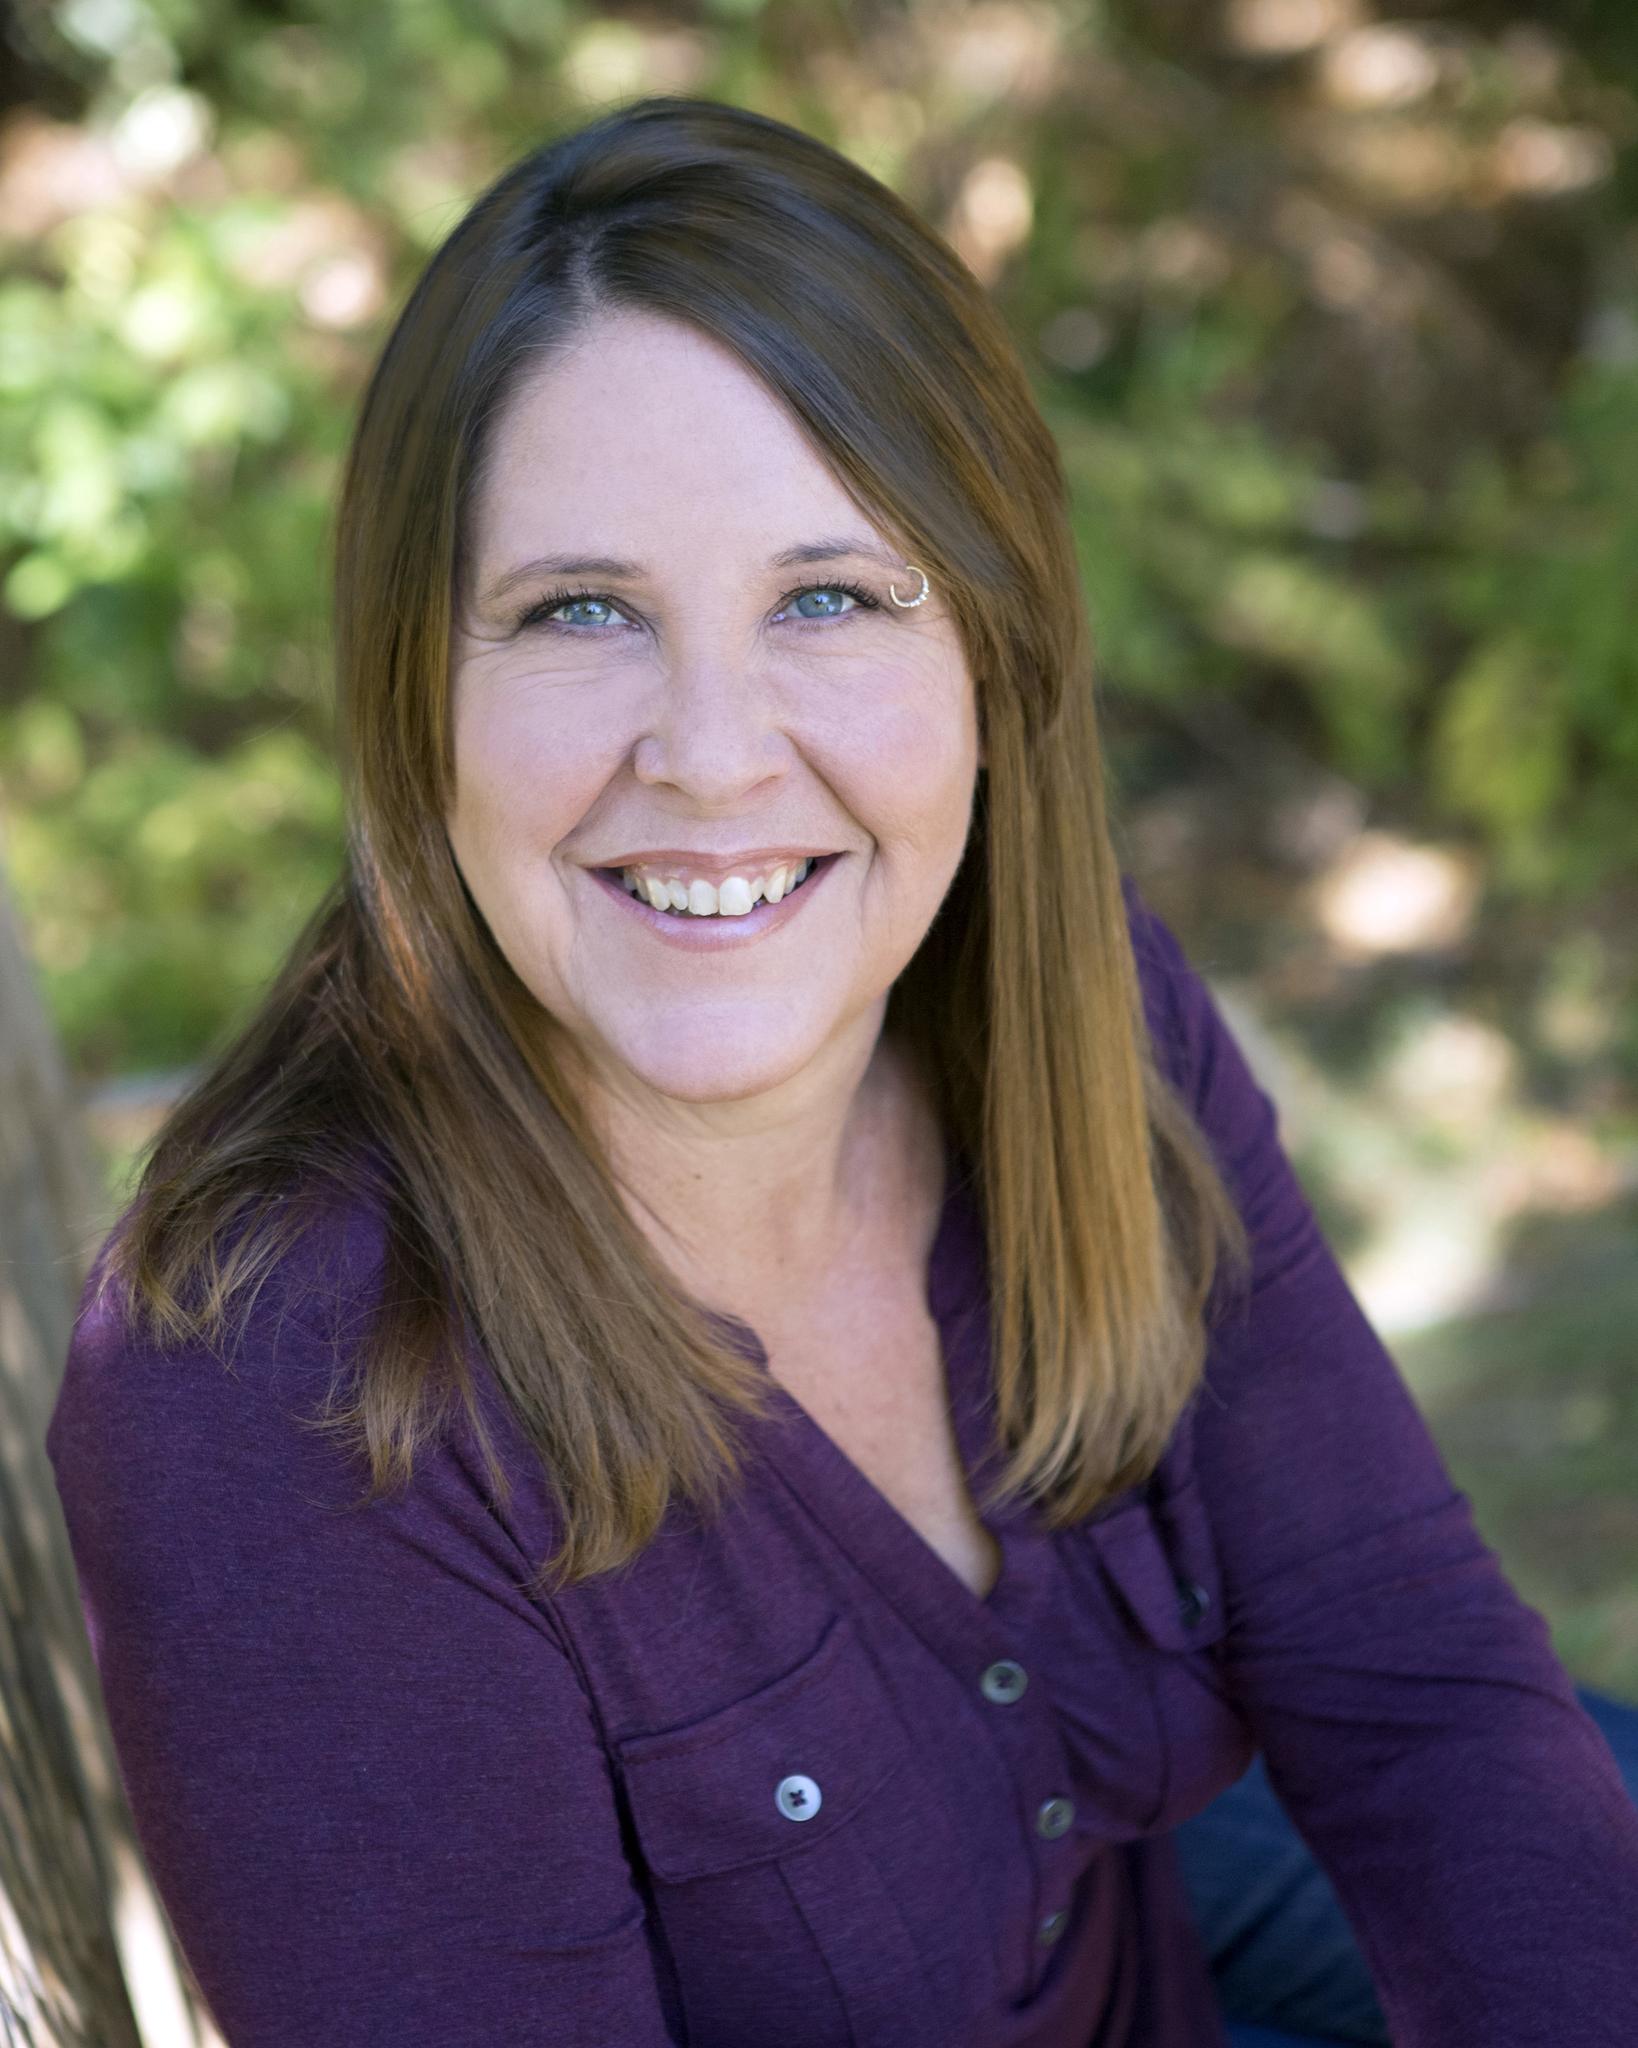 DemandGen Kathy Gillman